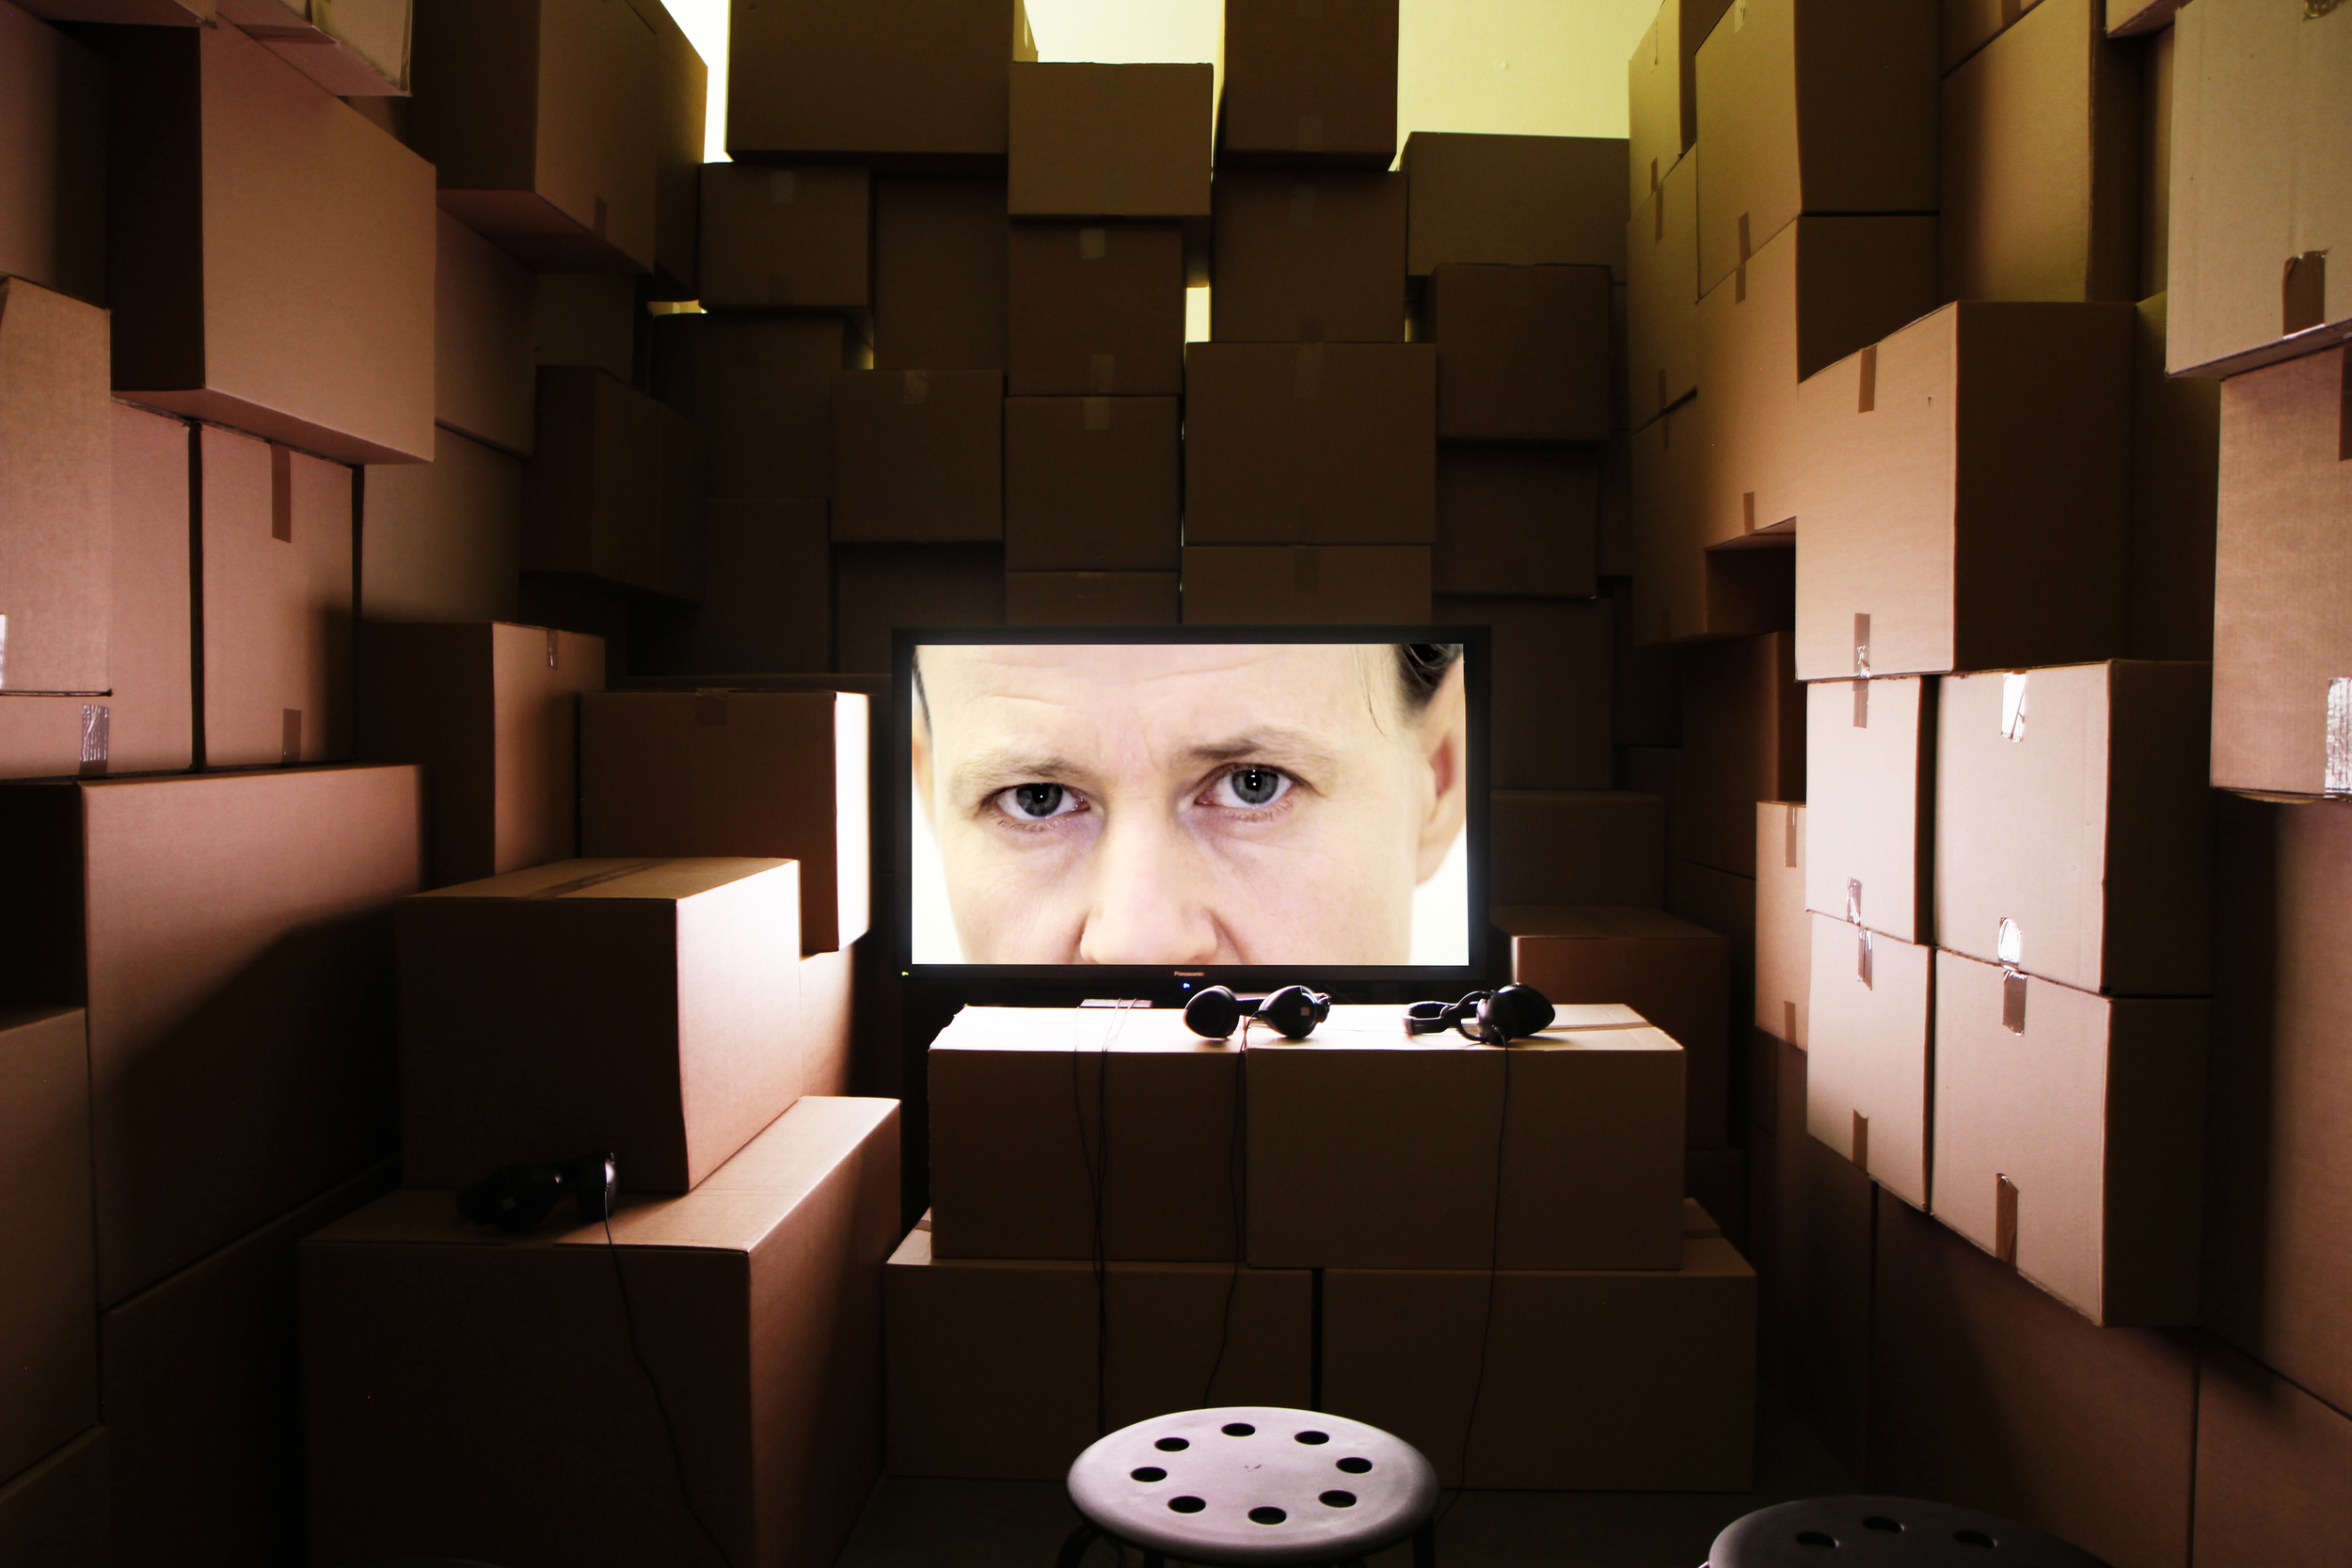 Riikka Kuoppala: Couch, TV and VCR. Installation image at Fondazione Sandretto Re Rebaudengo, Turin, 2013. Photo: Riikka Kuoppala